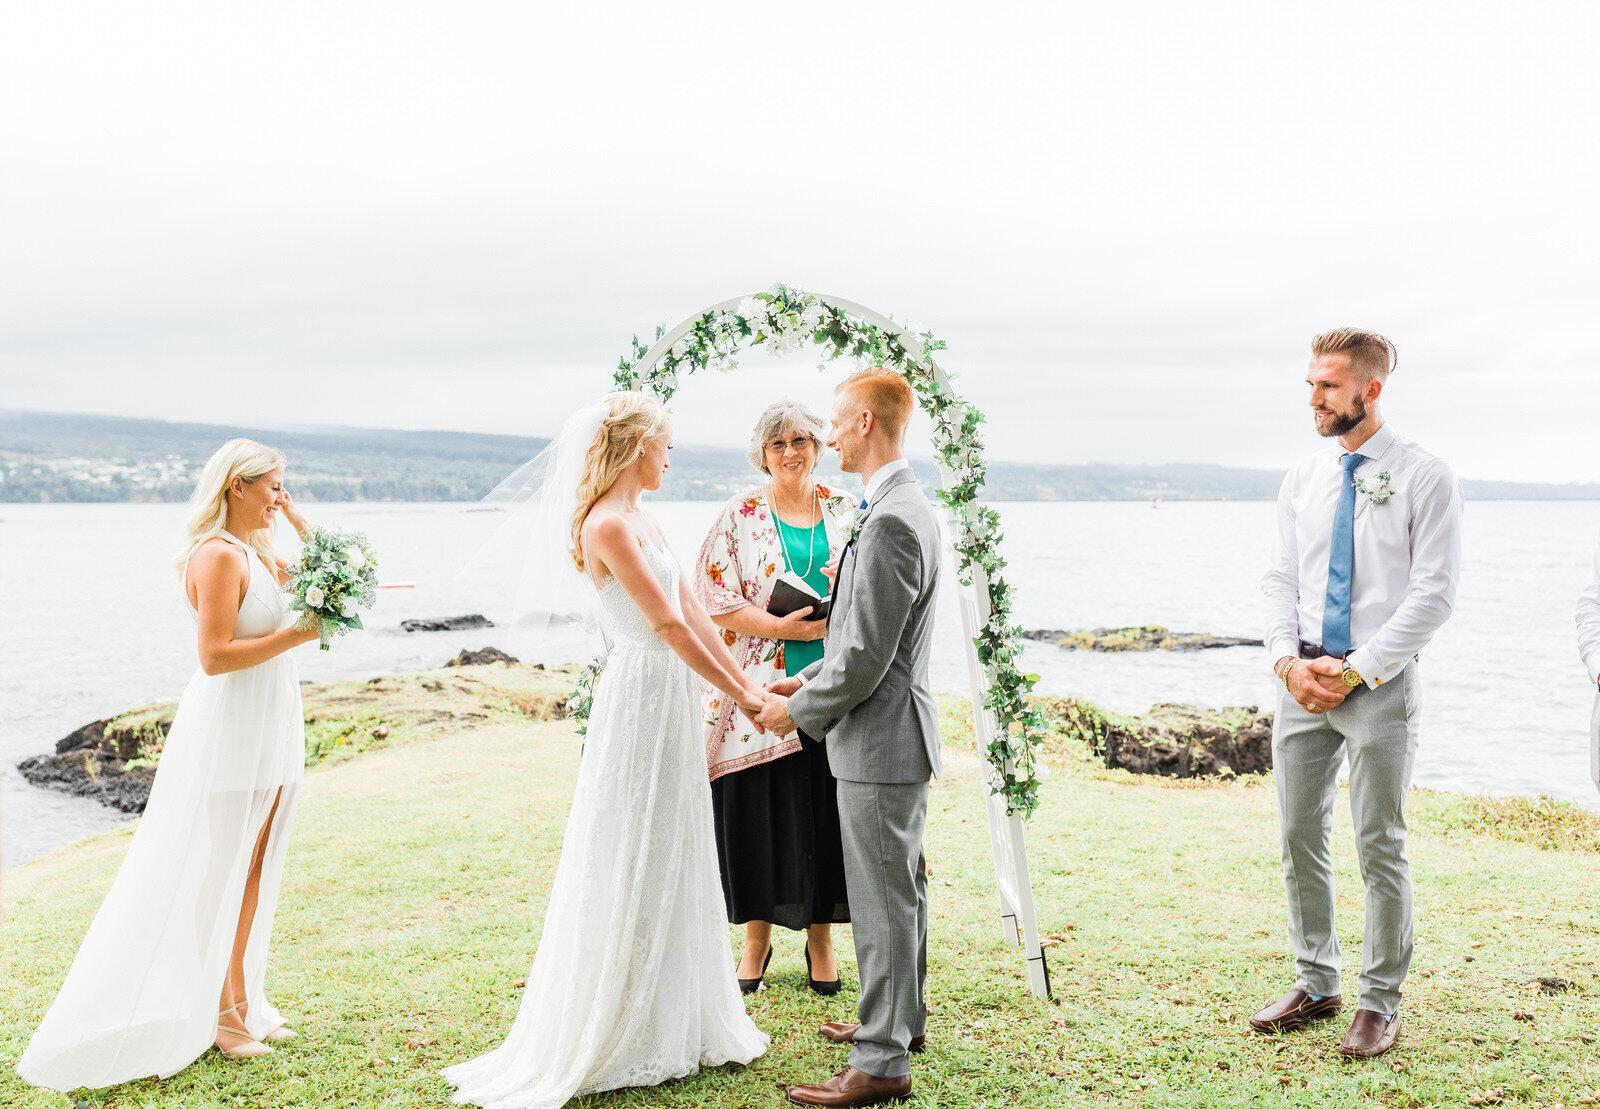 small-wedding-hawaii-destination-hilton-coconut-island-9682.jpg